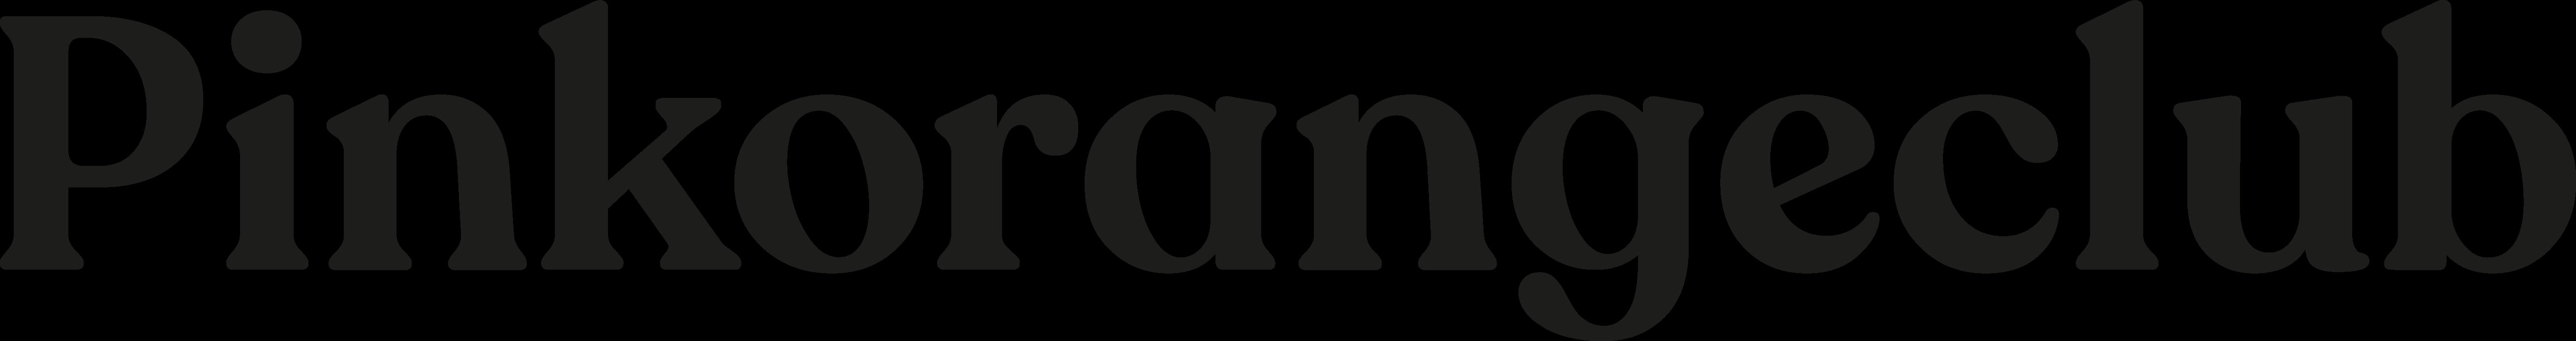 logo-van-pinkorangeclub